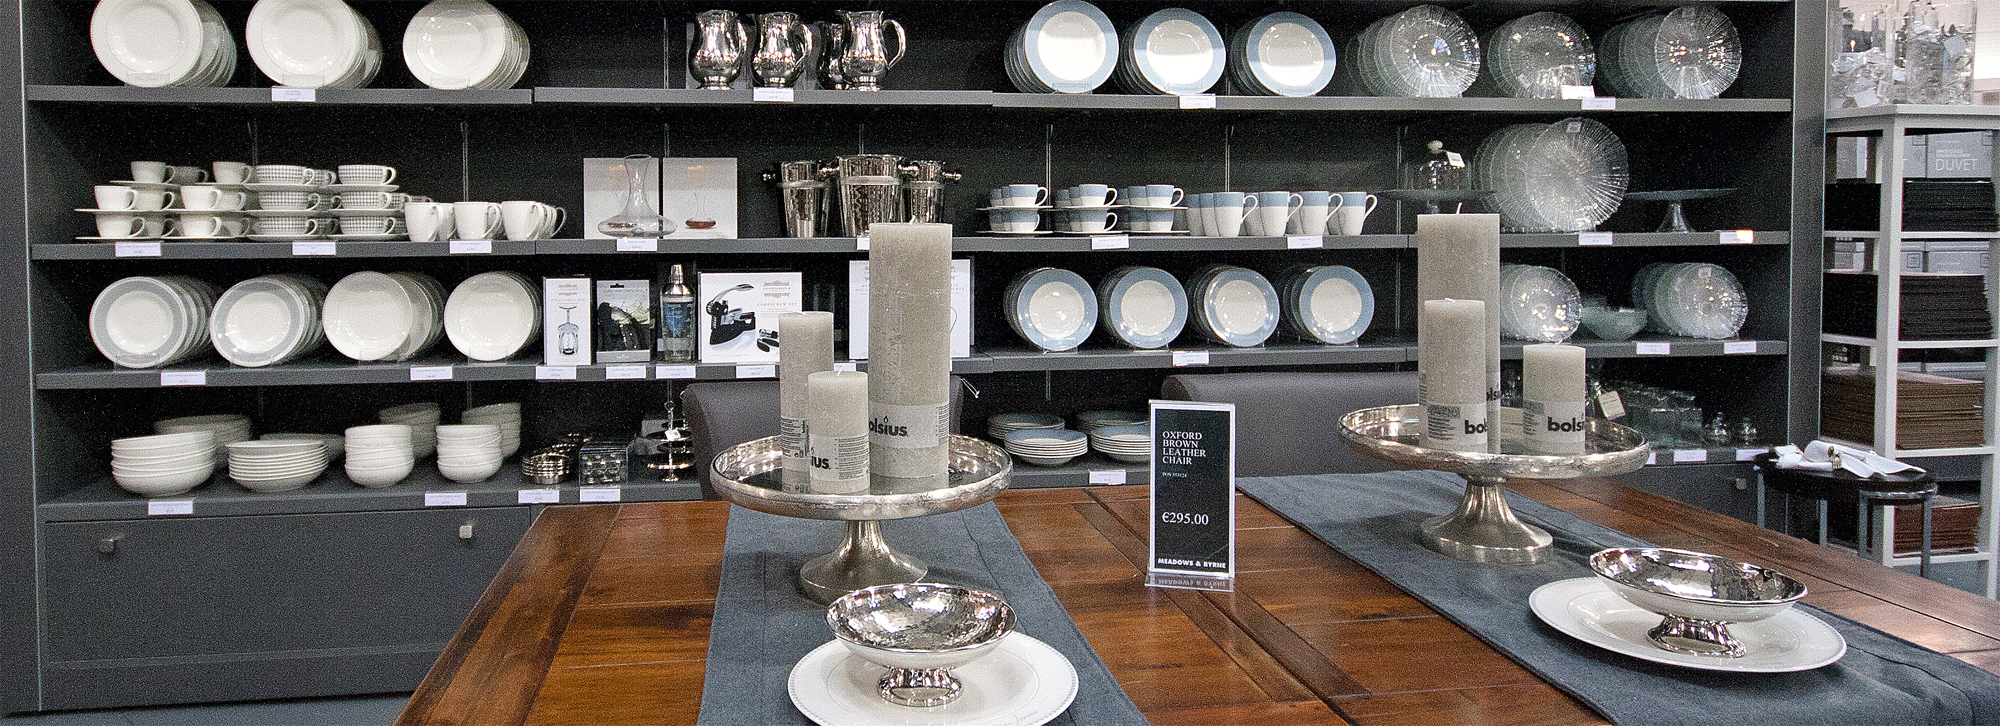 MeadowsandByrne-Store-Design_CentralUnit3